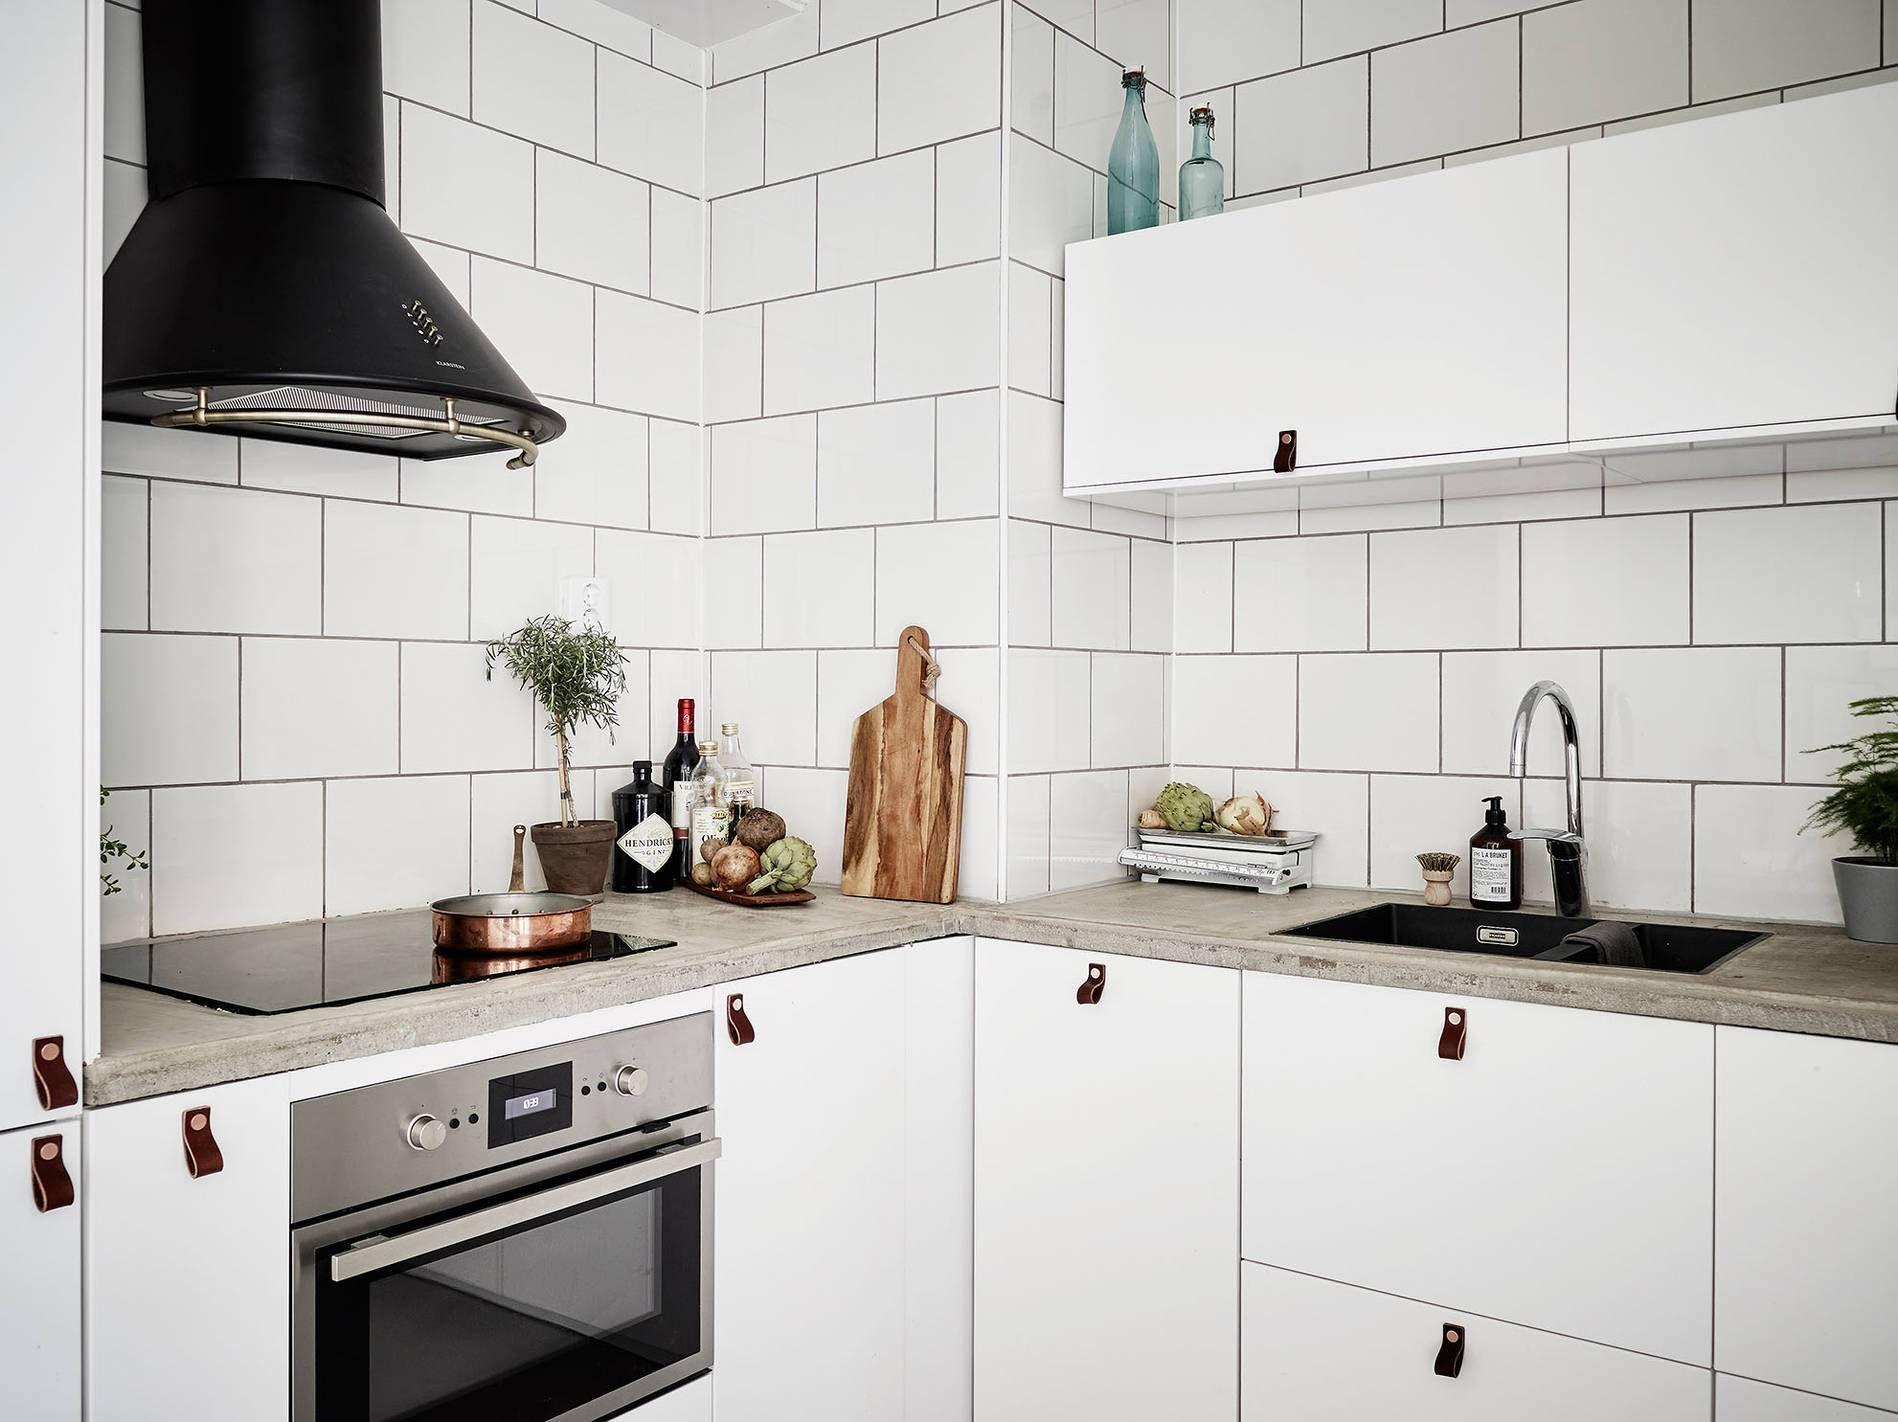 Explore White Kitchens Modern Kitchens and more